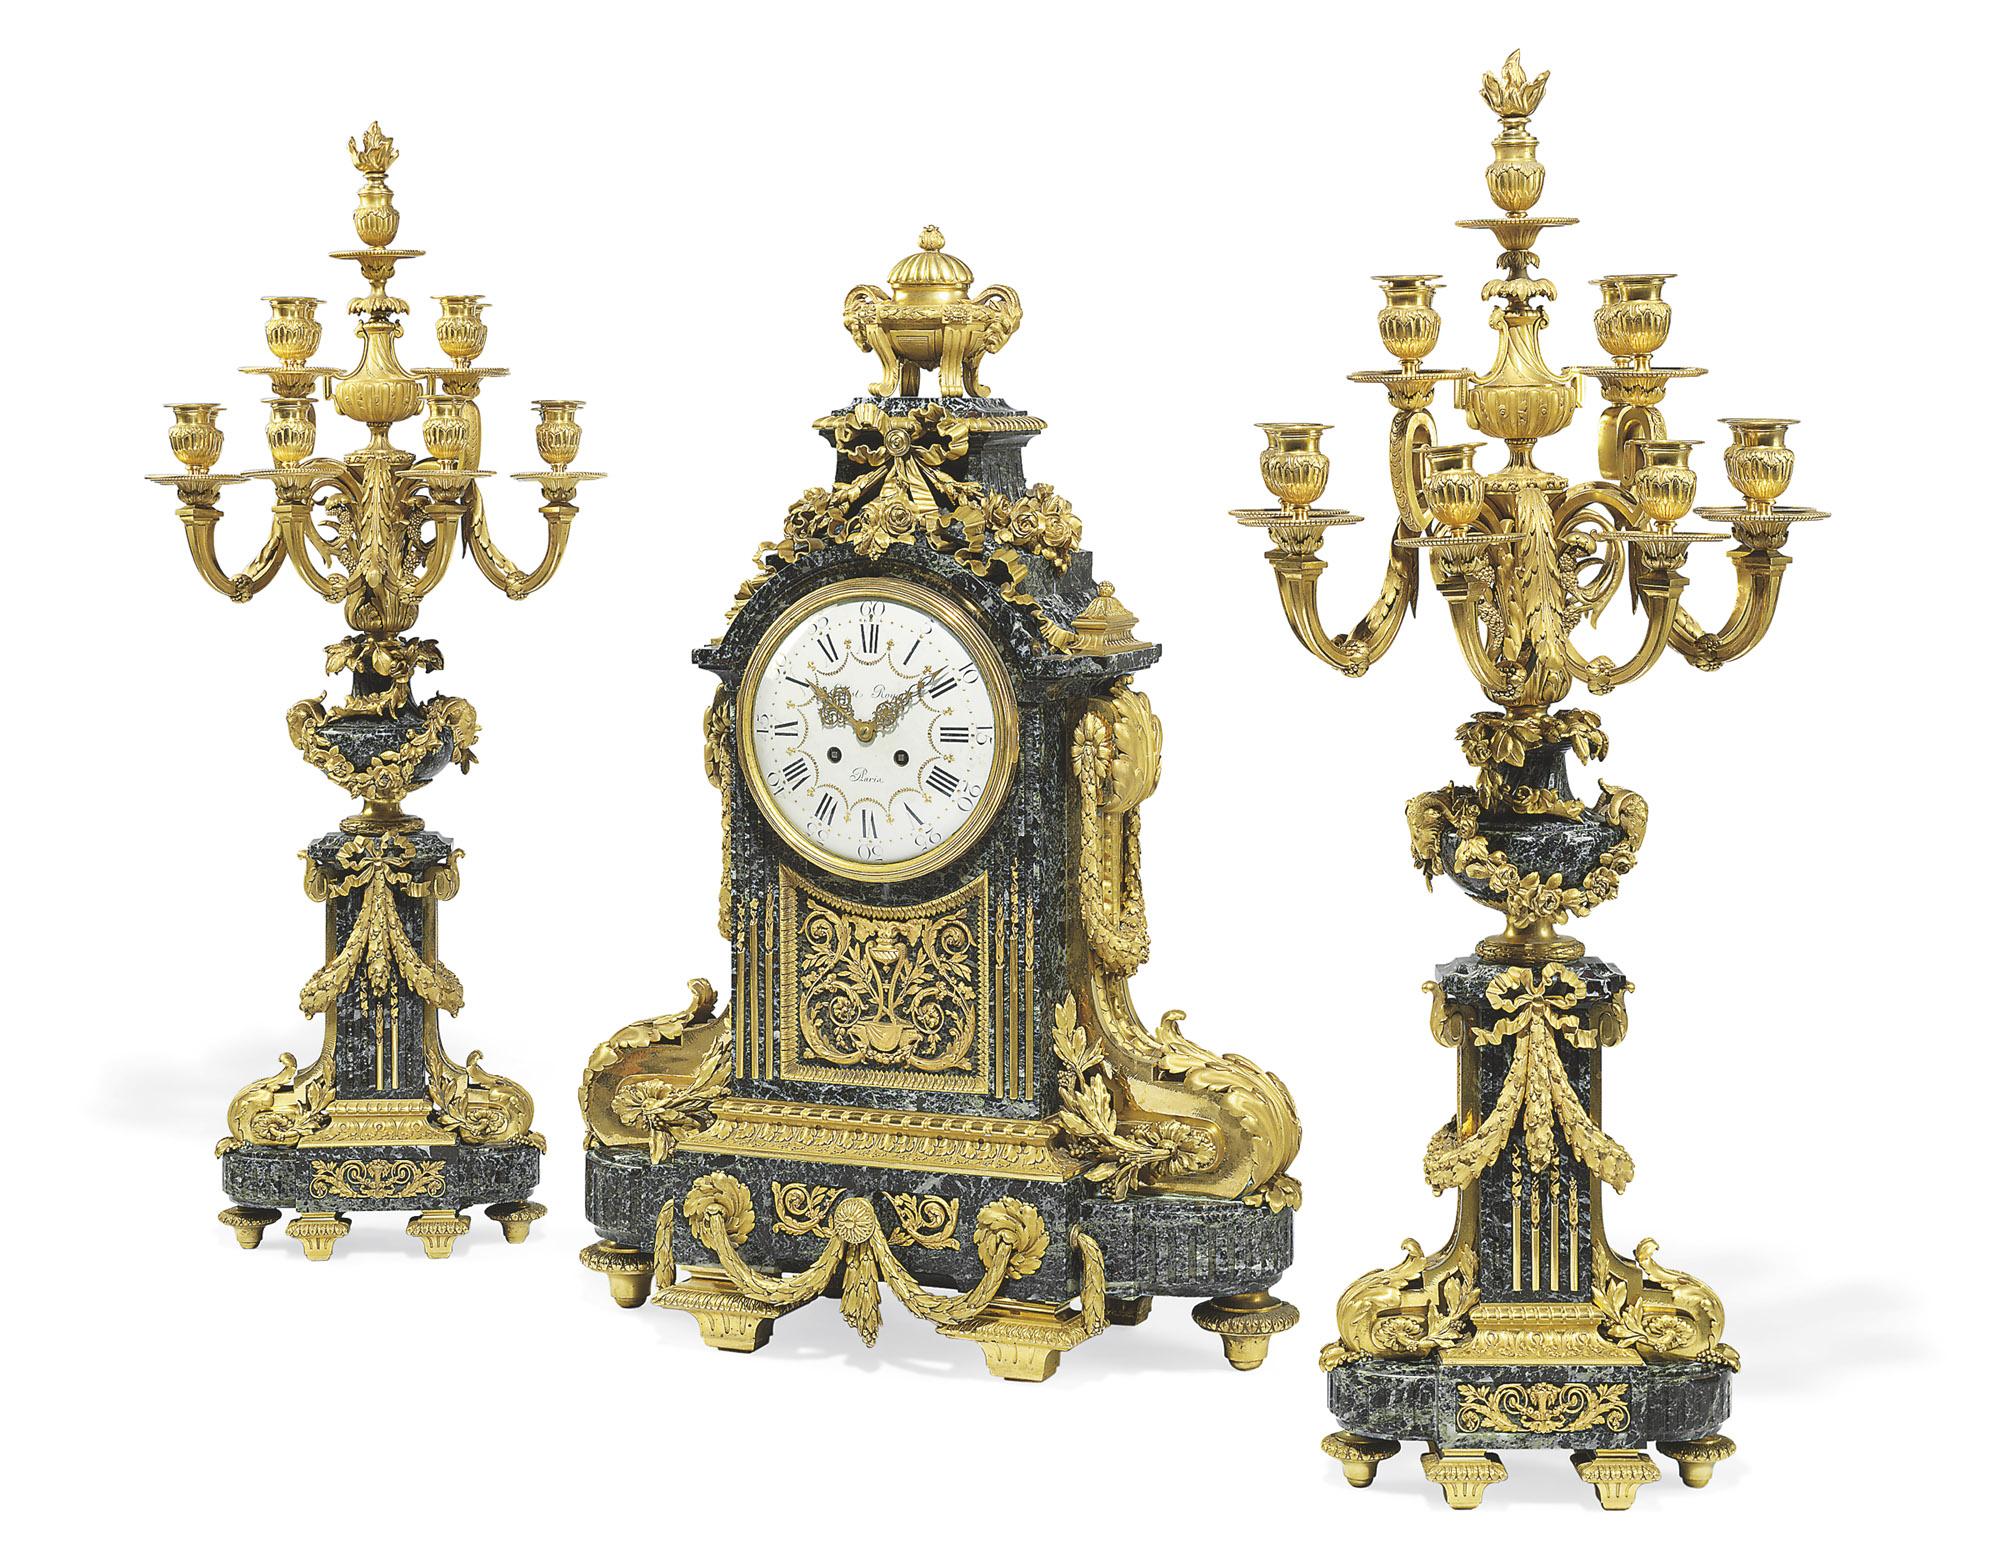 A LARGE NAPOLEON III ORMOLU AND MARBLE THREE-PIECE CLOCK GARNITURE